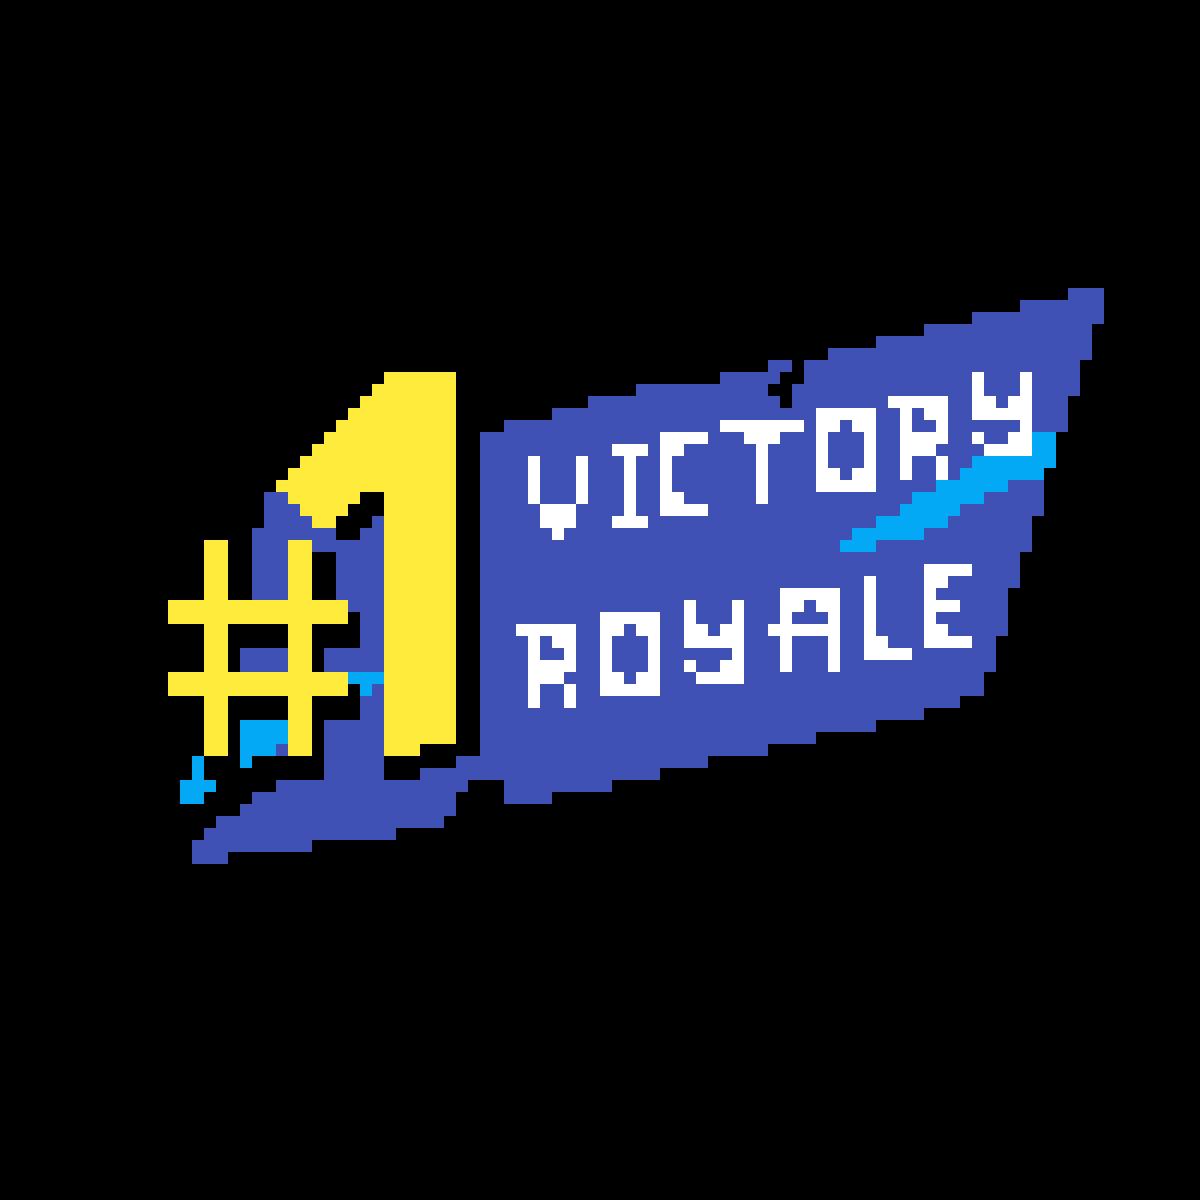 fortnite victory royale logo - fortnite victory royale images